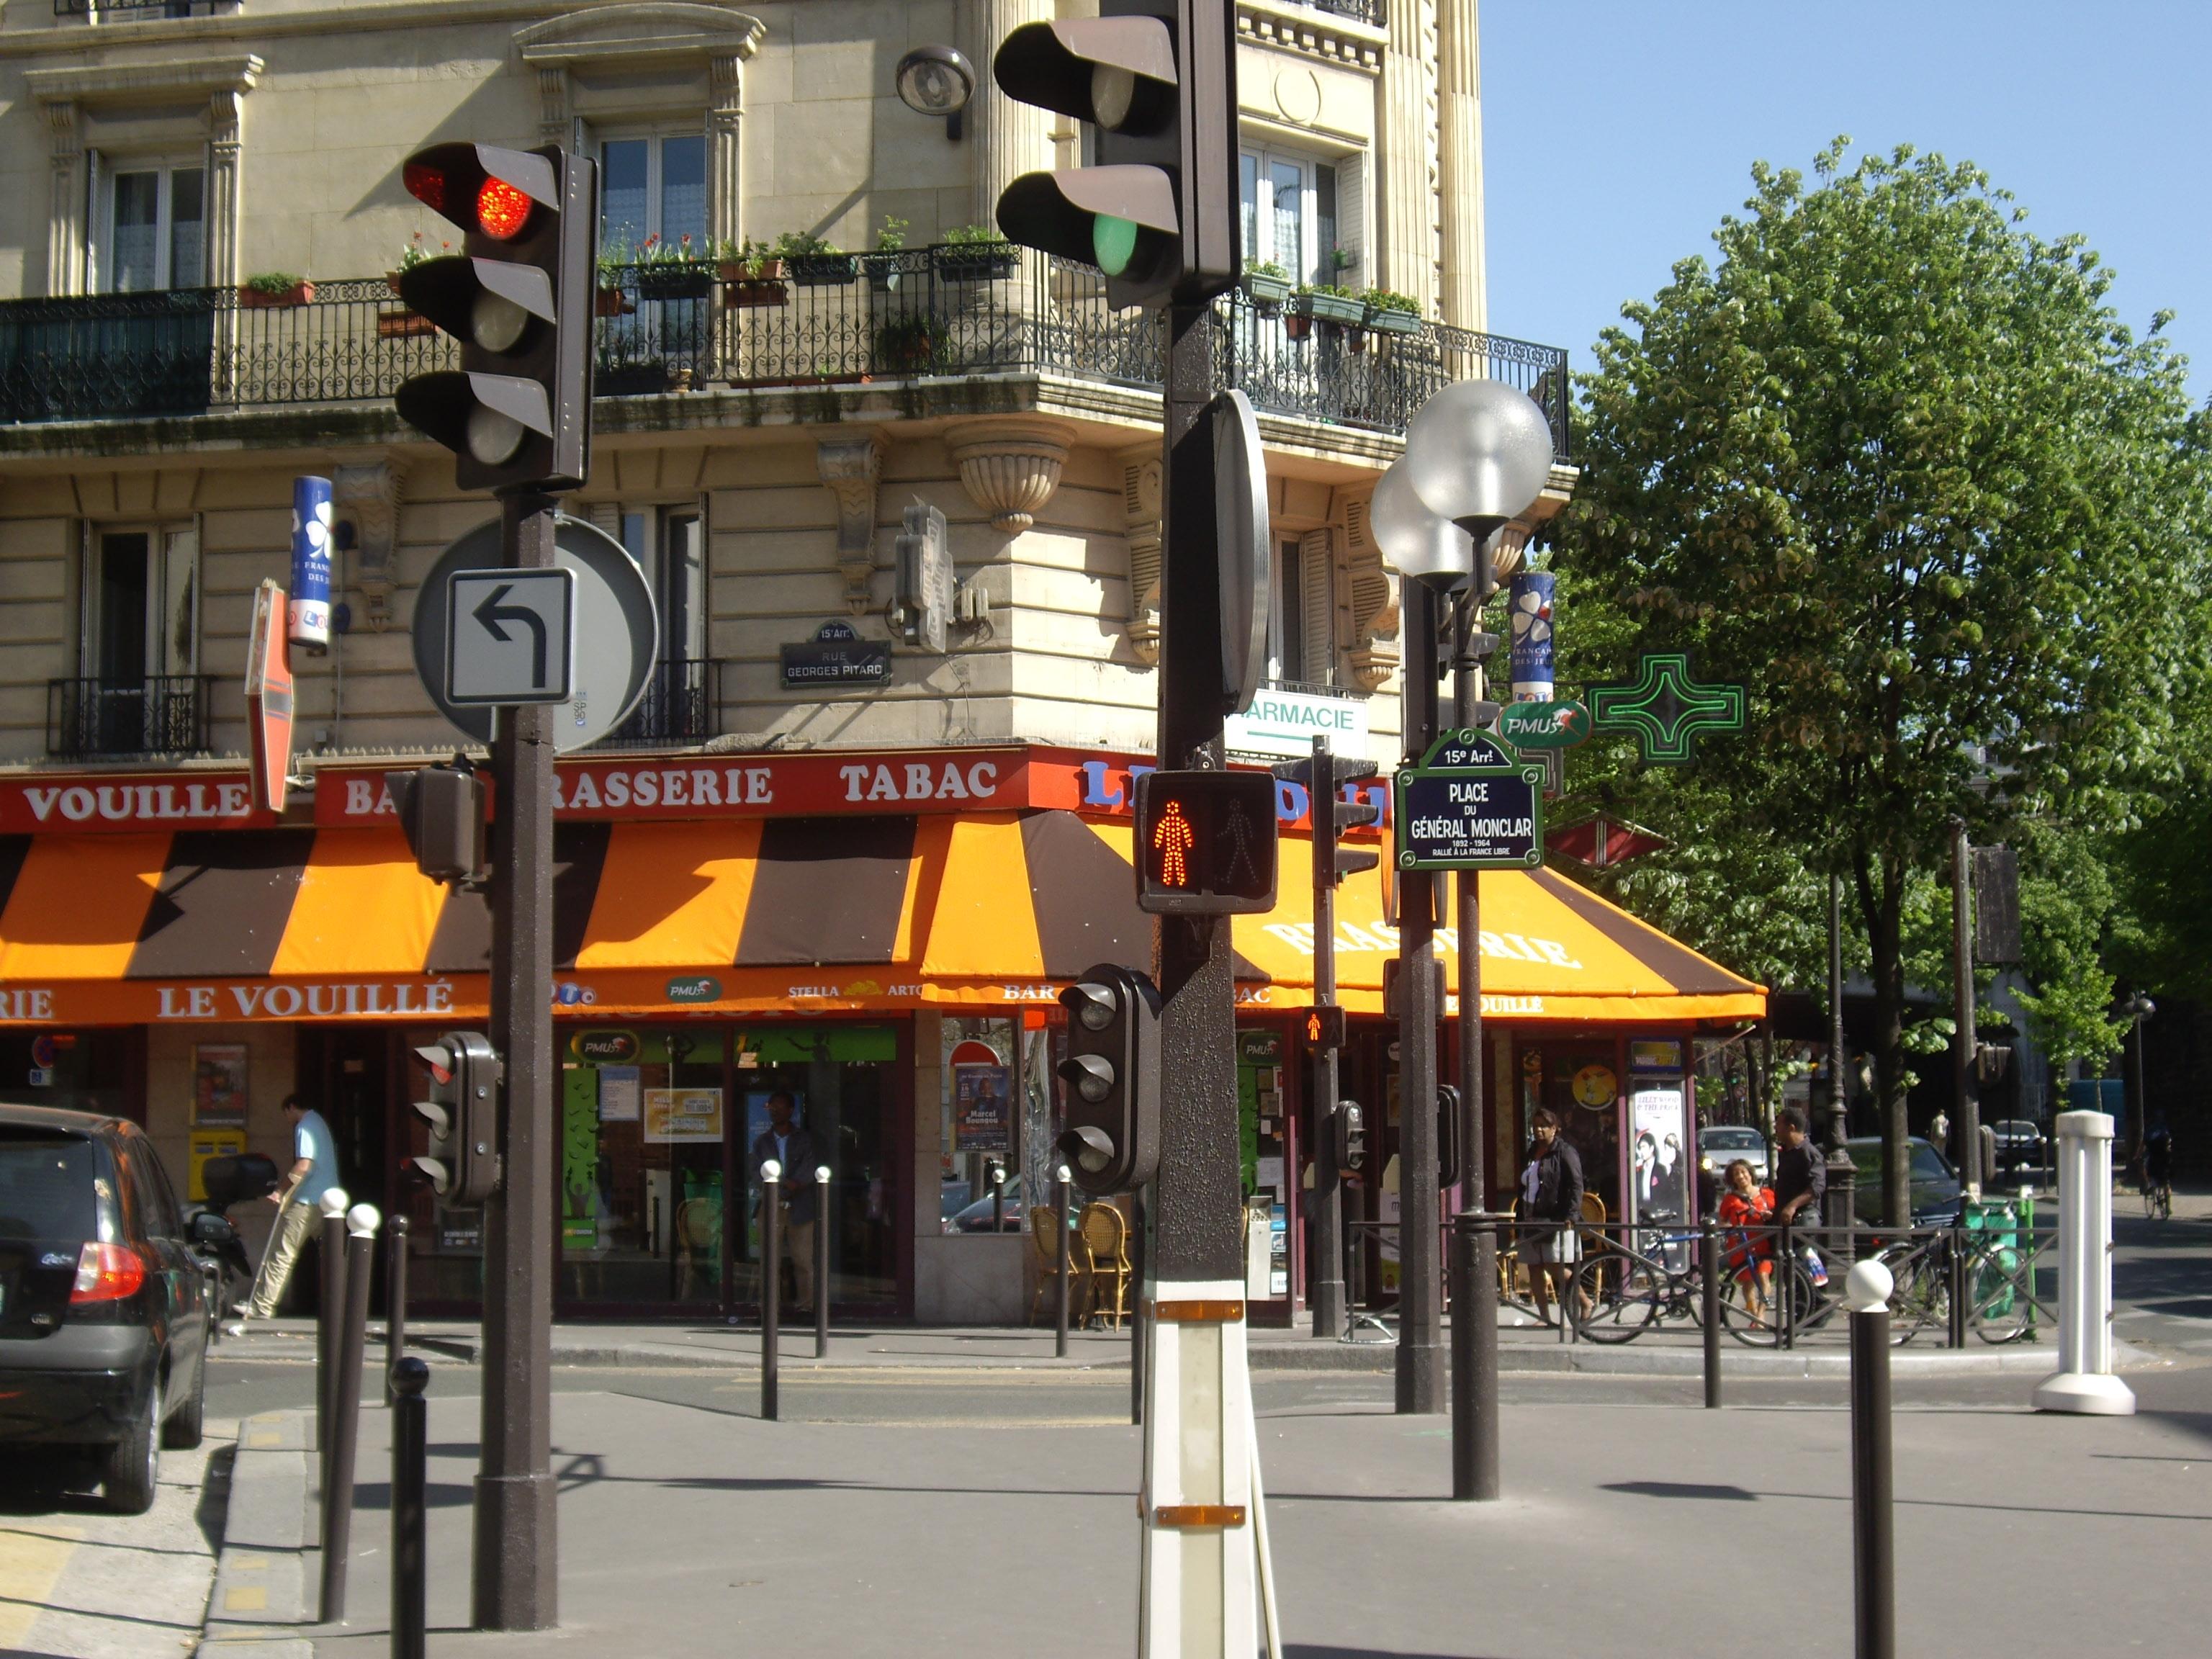 file rue georges pitard place du g n ral monclar paris wikimedia commons. Black Bedroom Furniture Sets. Home Design Ideas